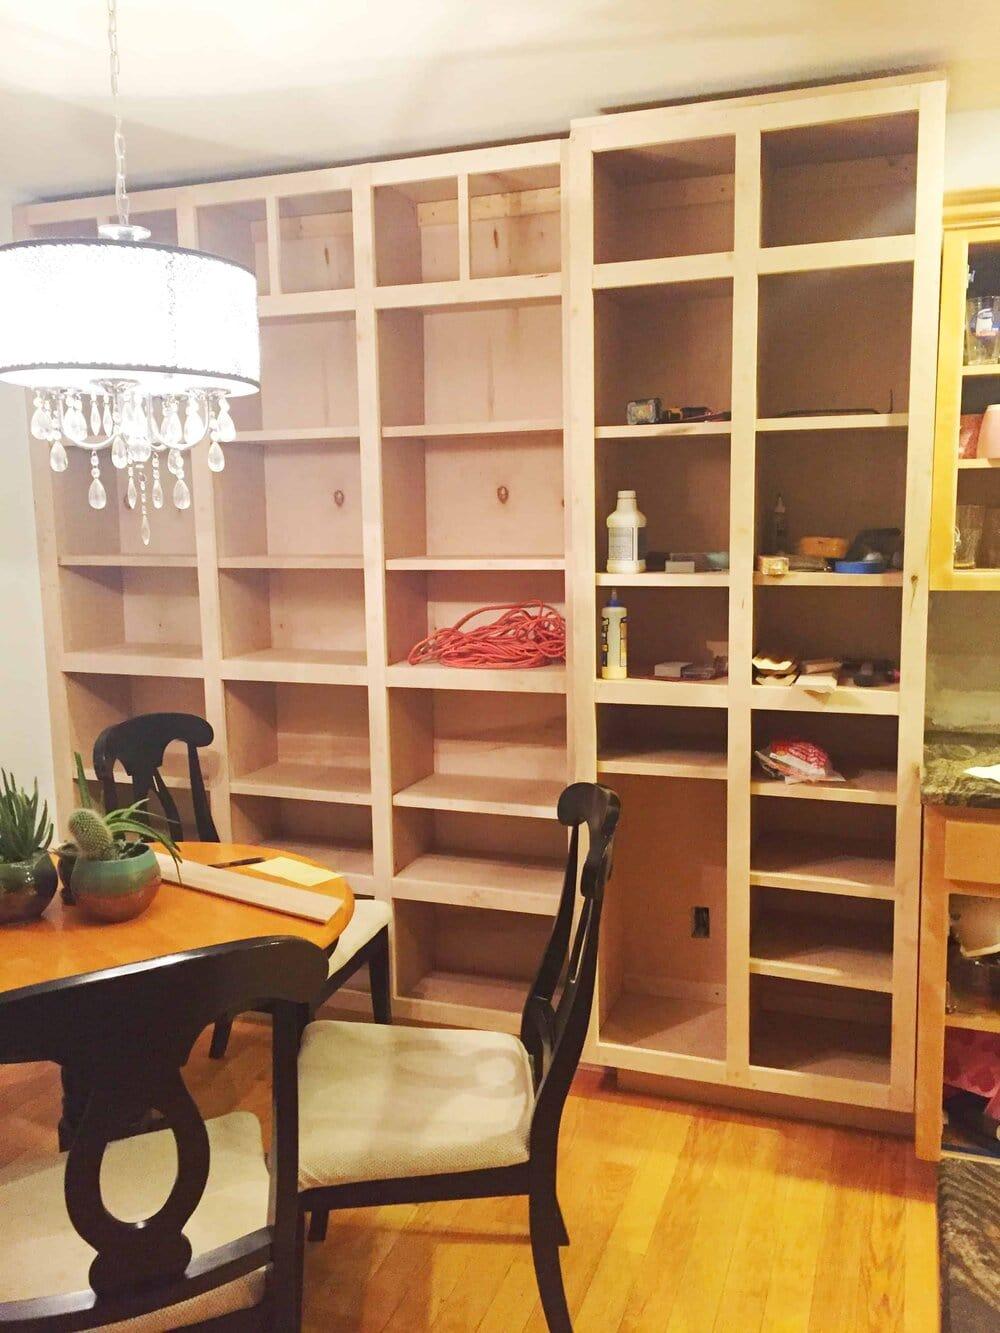 Missouri Girl kitchen renovation. DIY kitchen cabinets. Missouri Girl Blog.